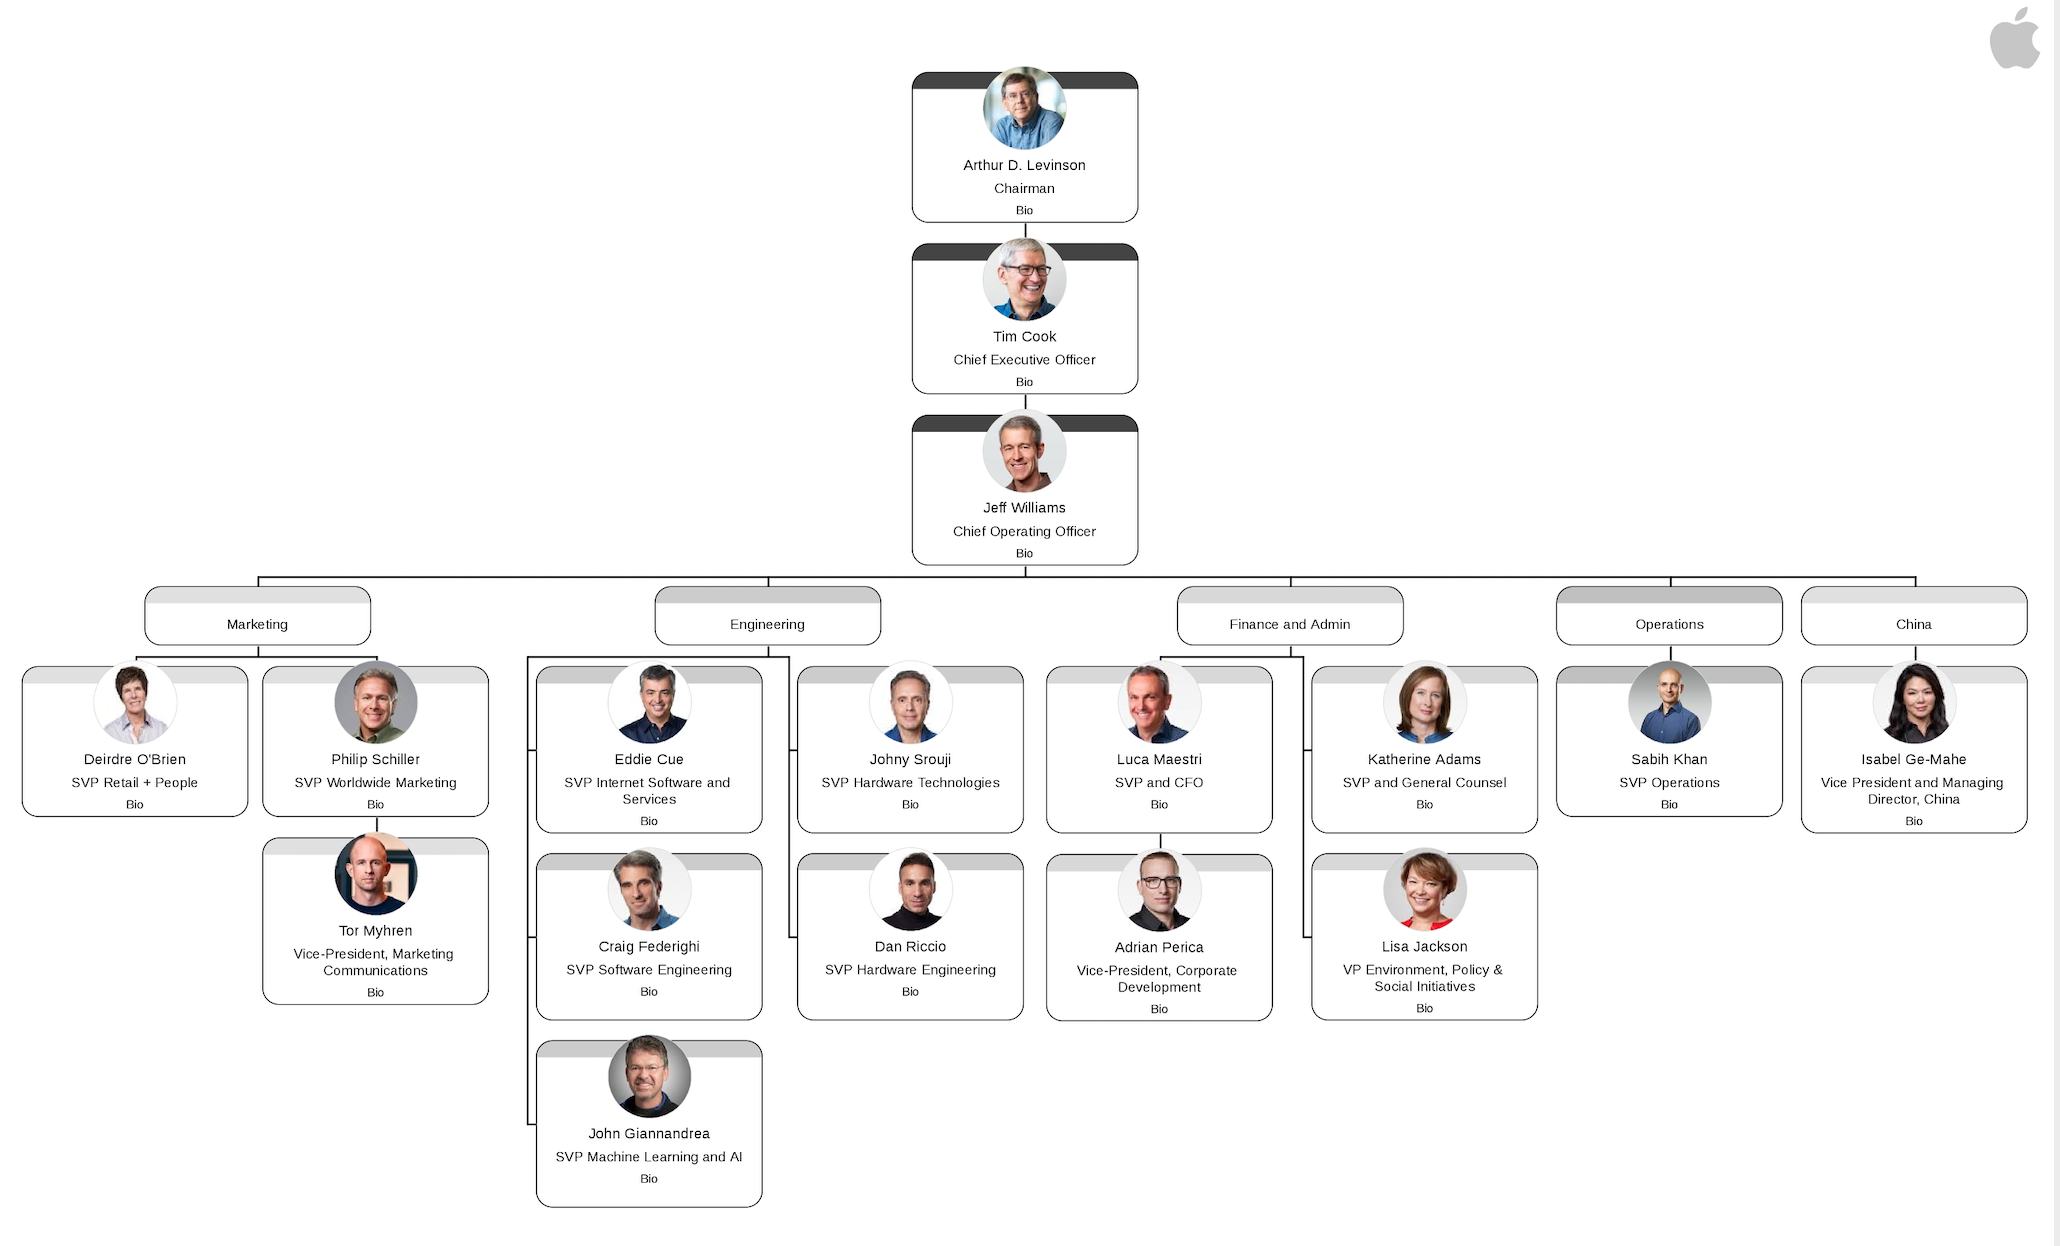 Apple's Organizational Structure